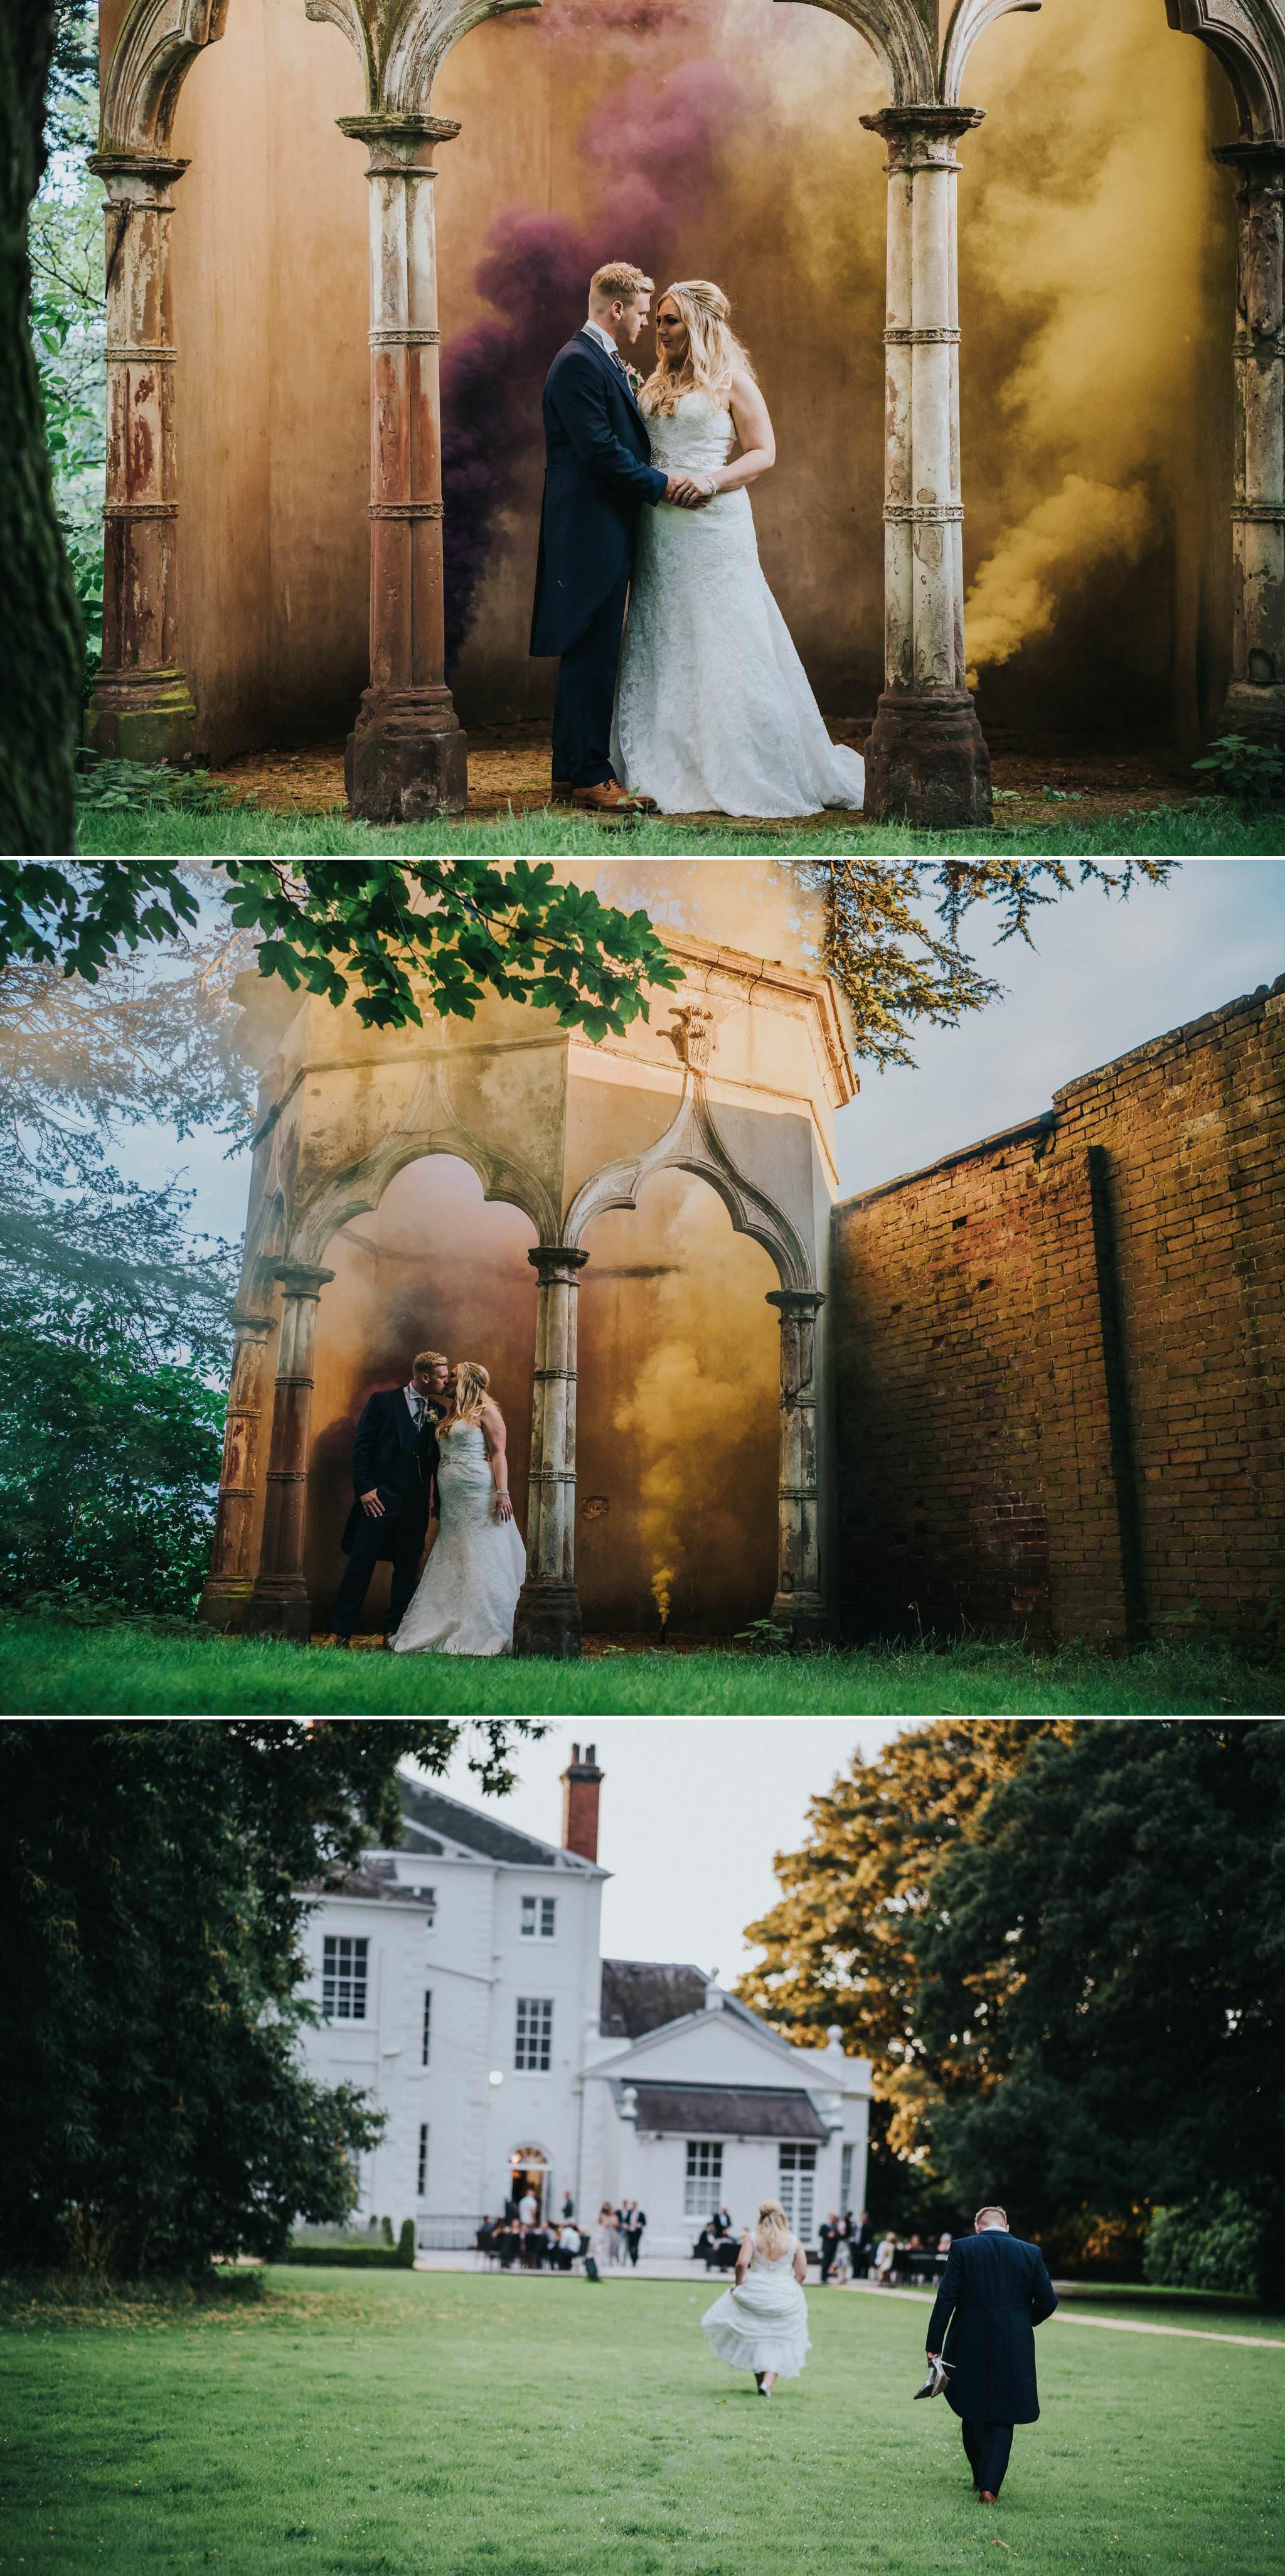 somerford-hall-wedding-photography 20.jpg